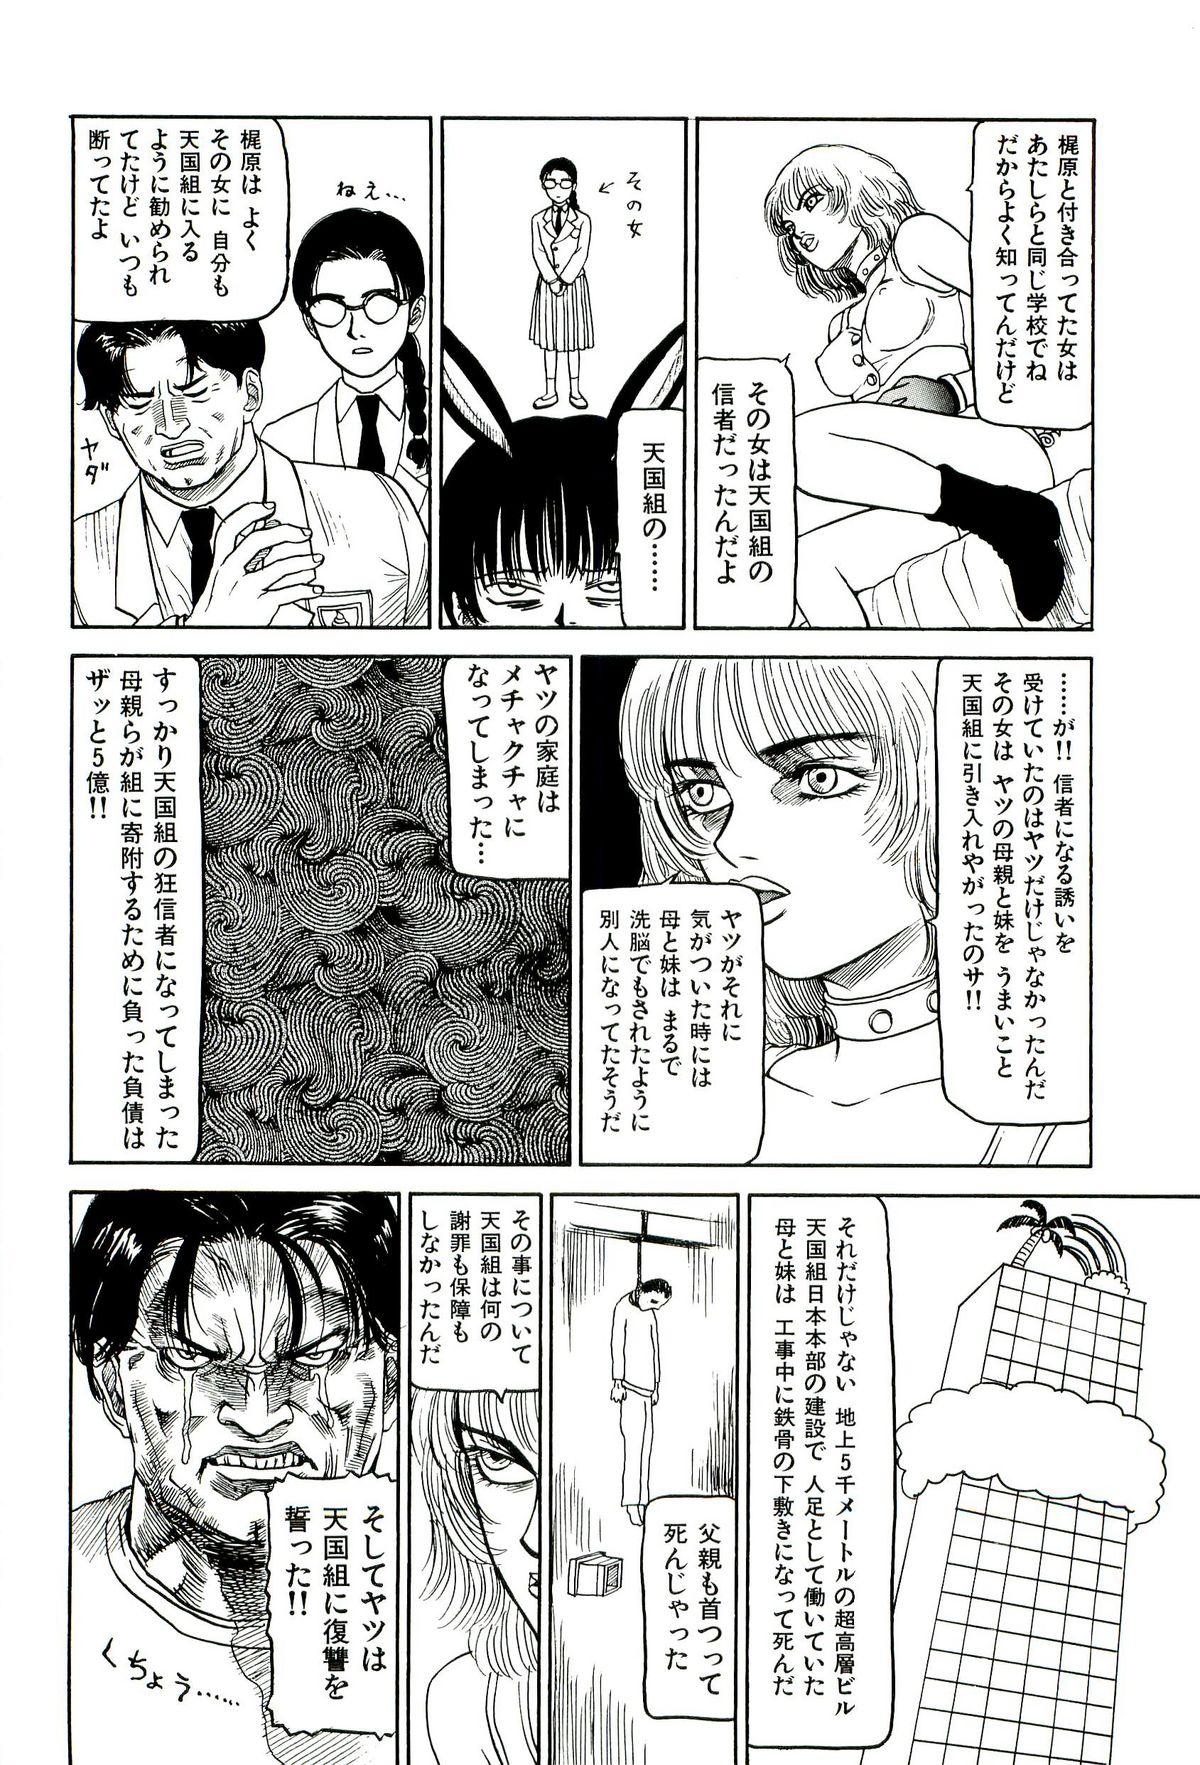 Jigokugumi no Onna 1 149